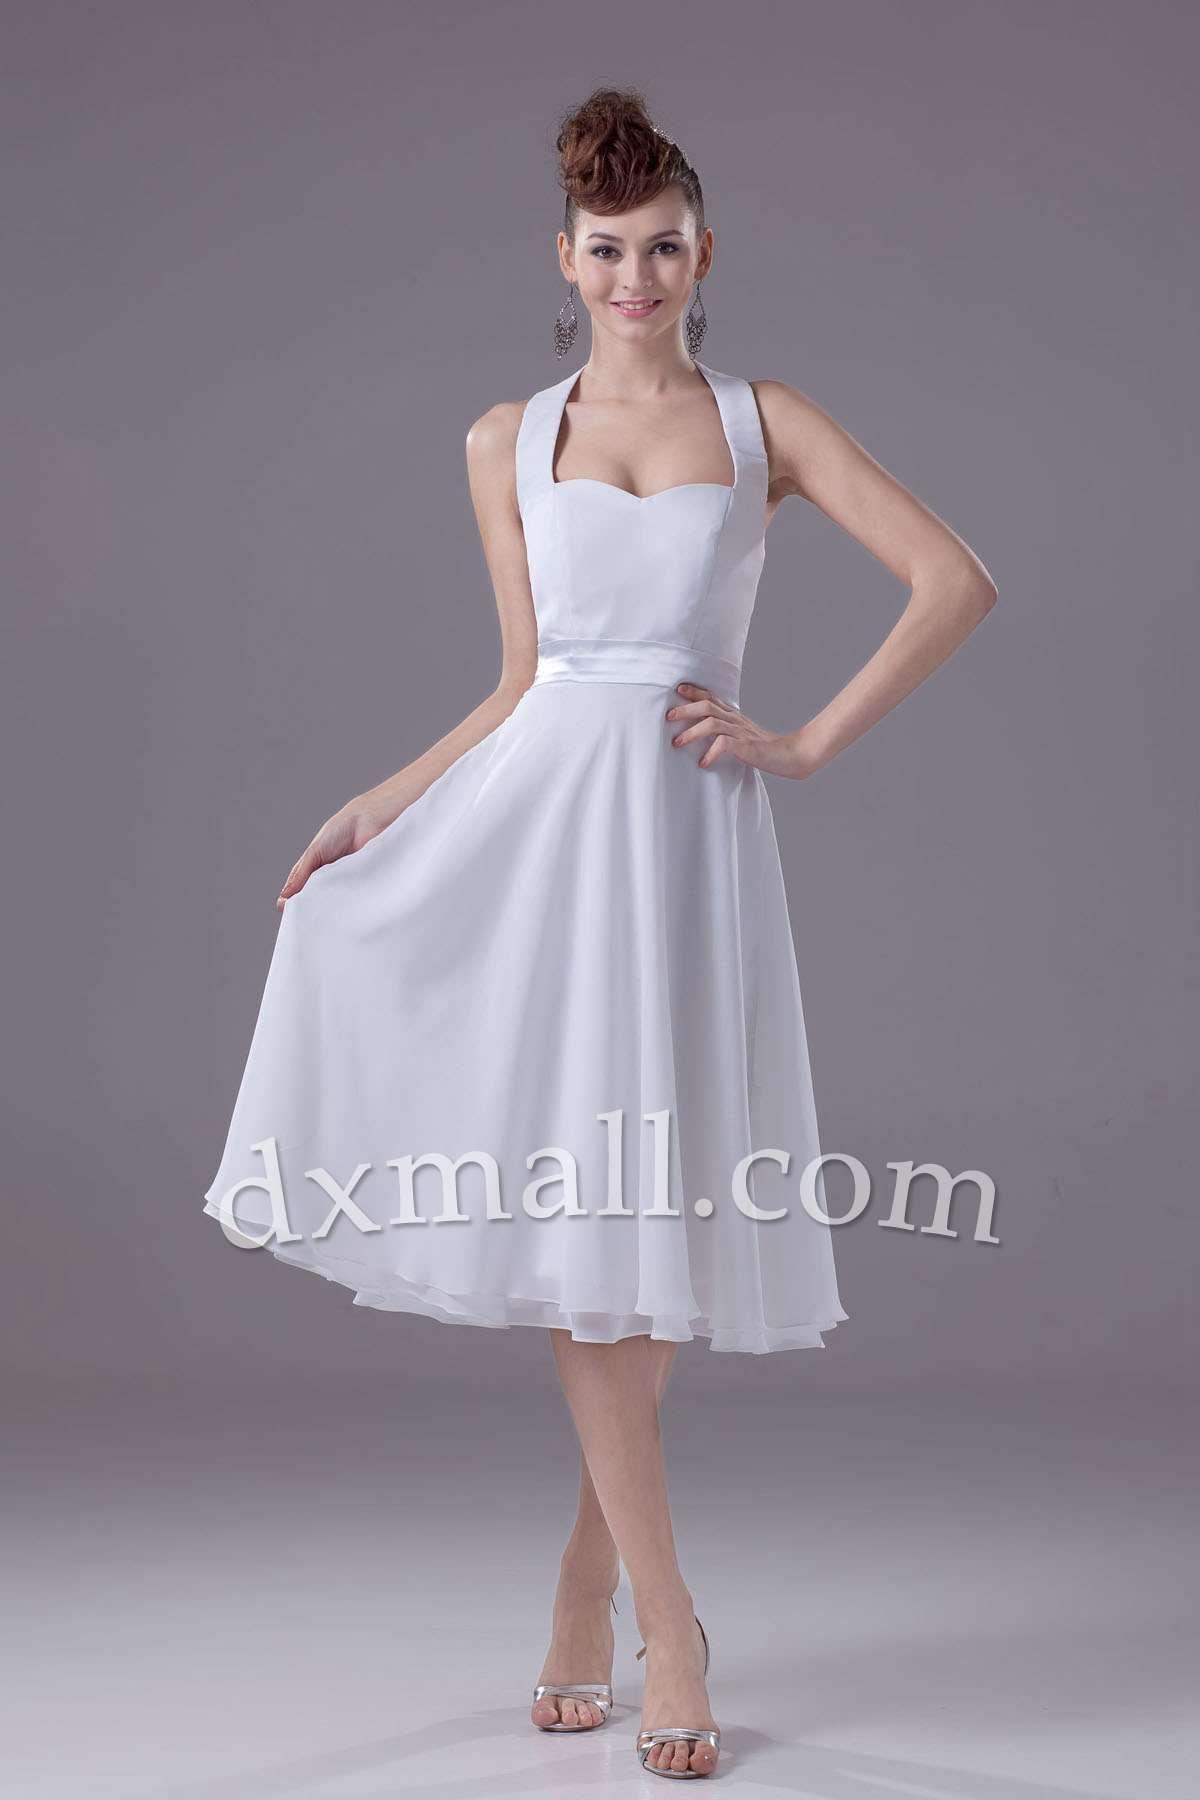 Short graduation dresses straps knee length chiffon white short graduation dresses straps knee length chiffon white 10001060002 ombrellifo Choice Image